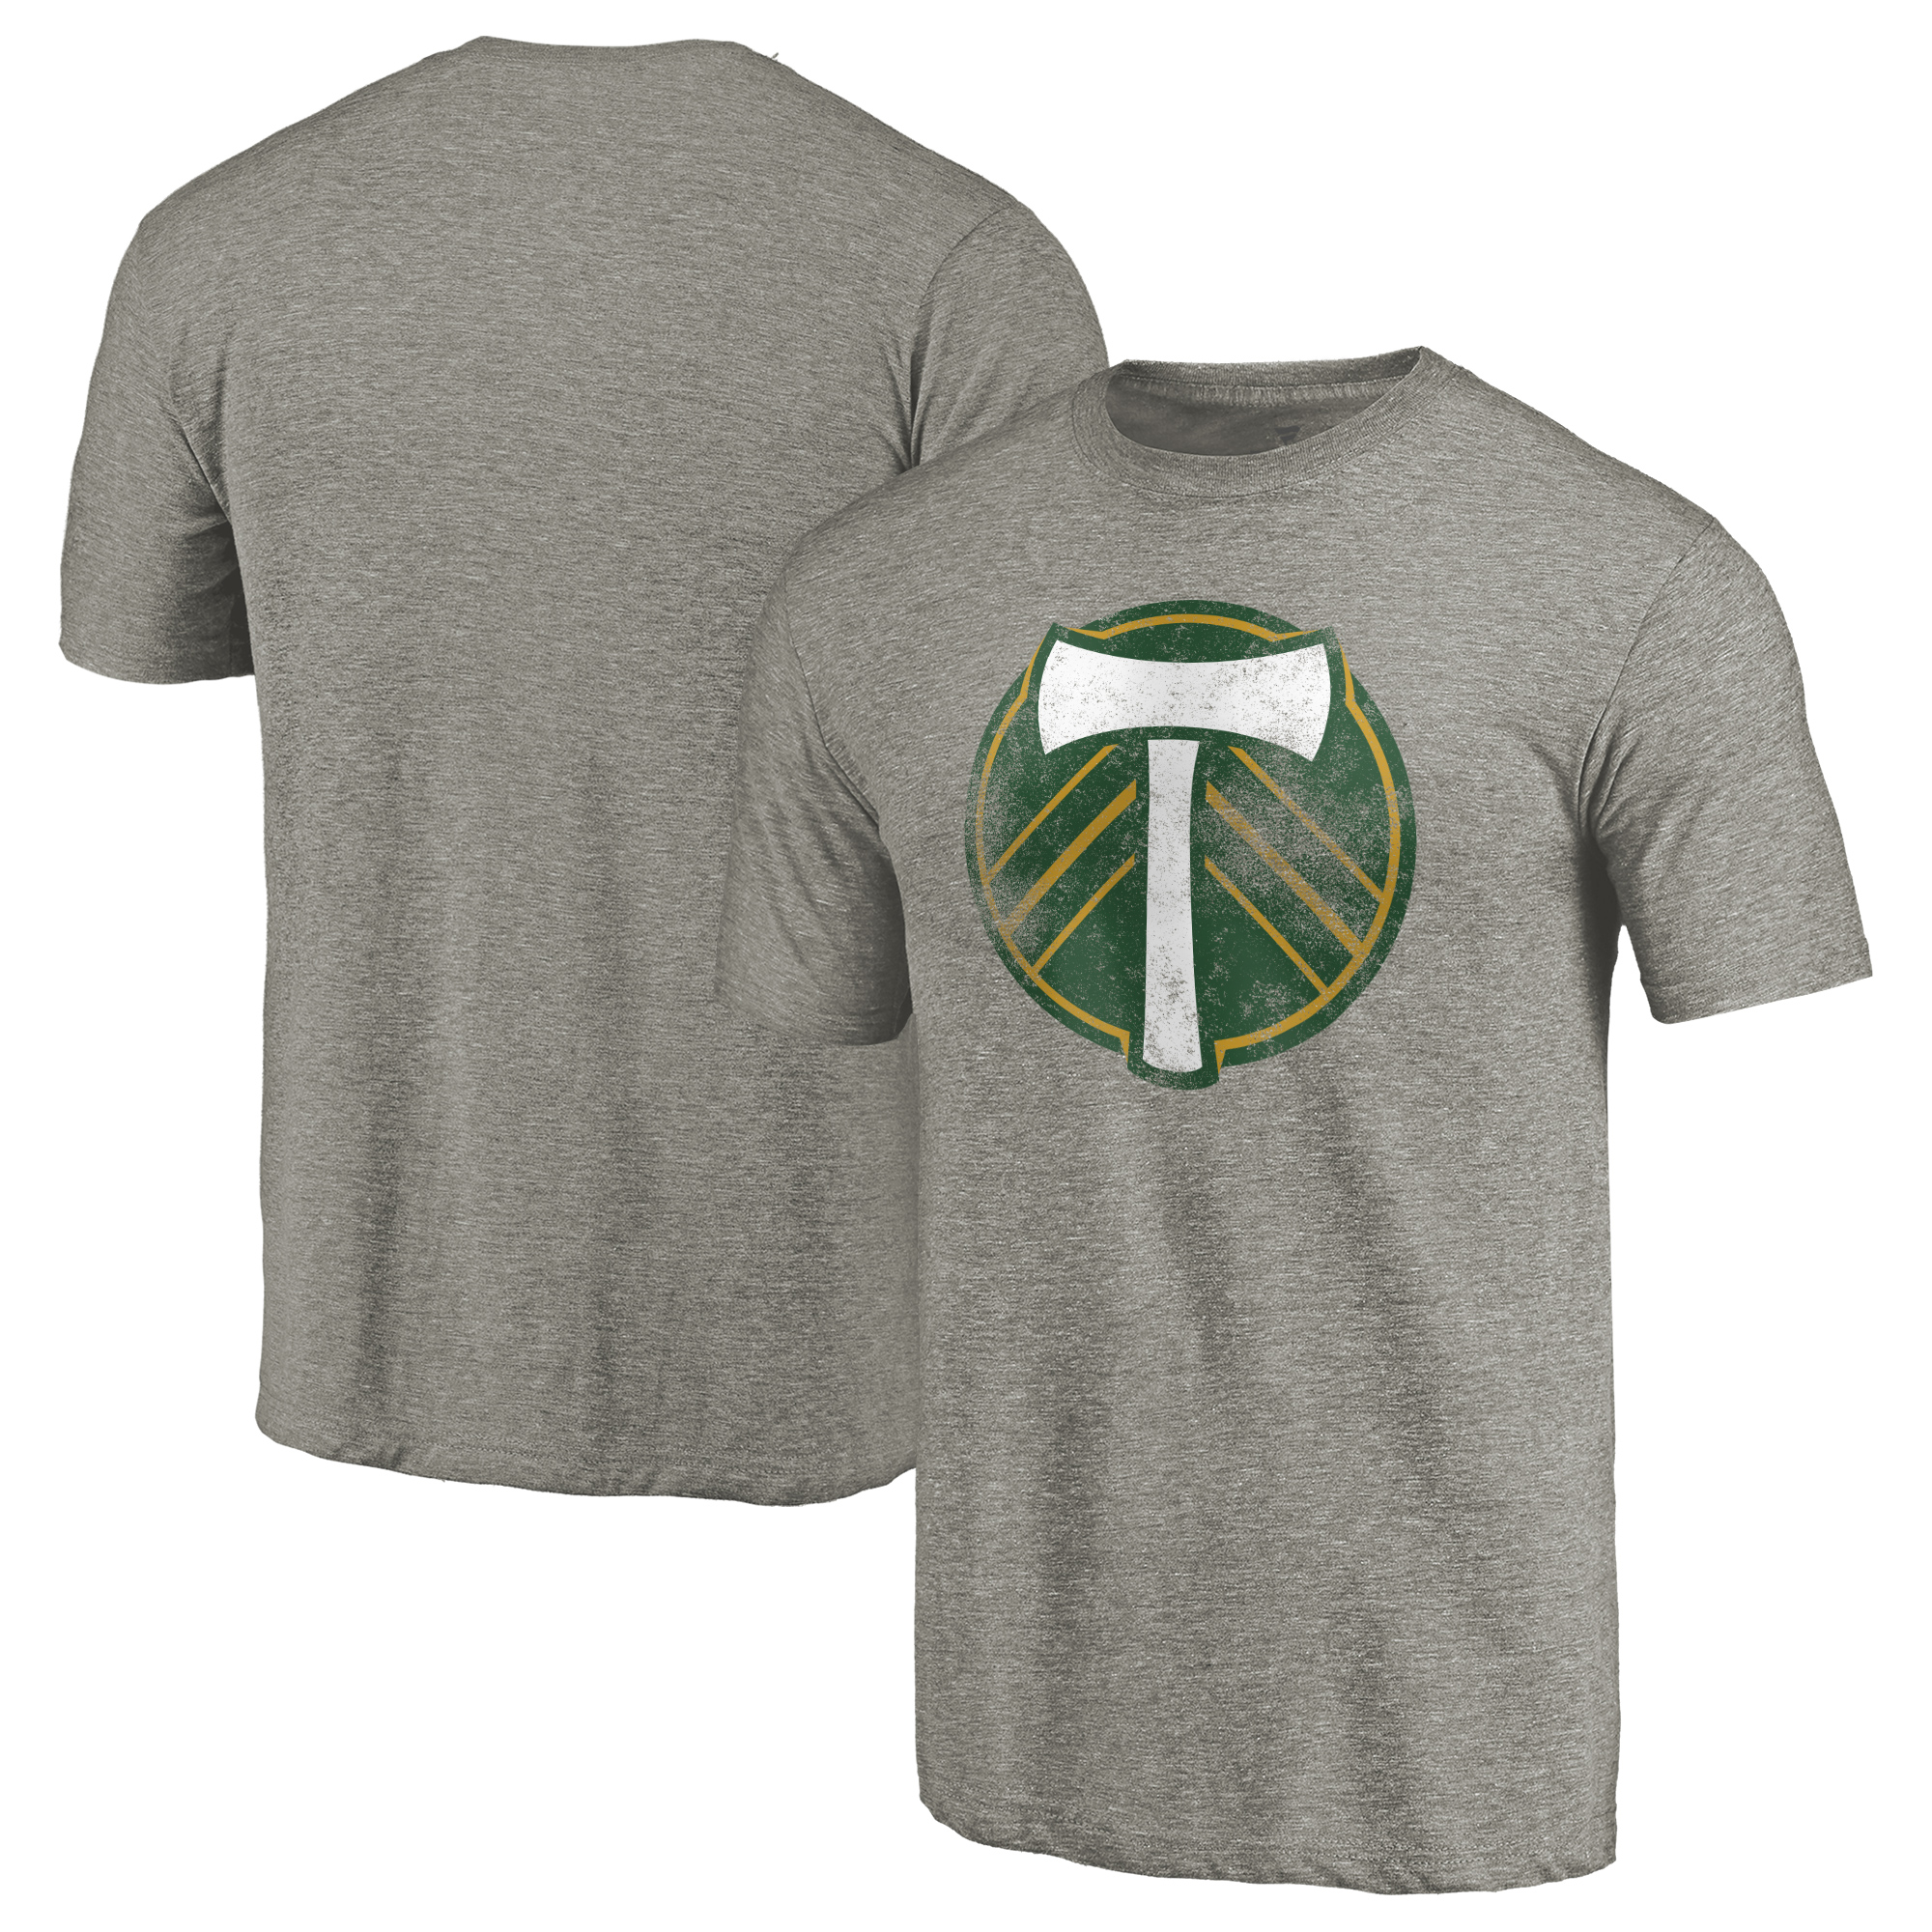 Portland Timbers Fanatics Branded Distressed Primary Logo Tri-Blend T-Shirt - Gray